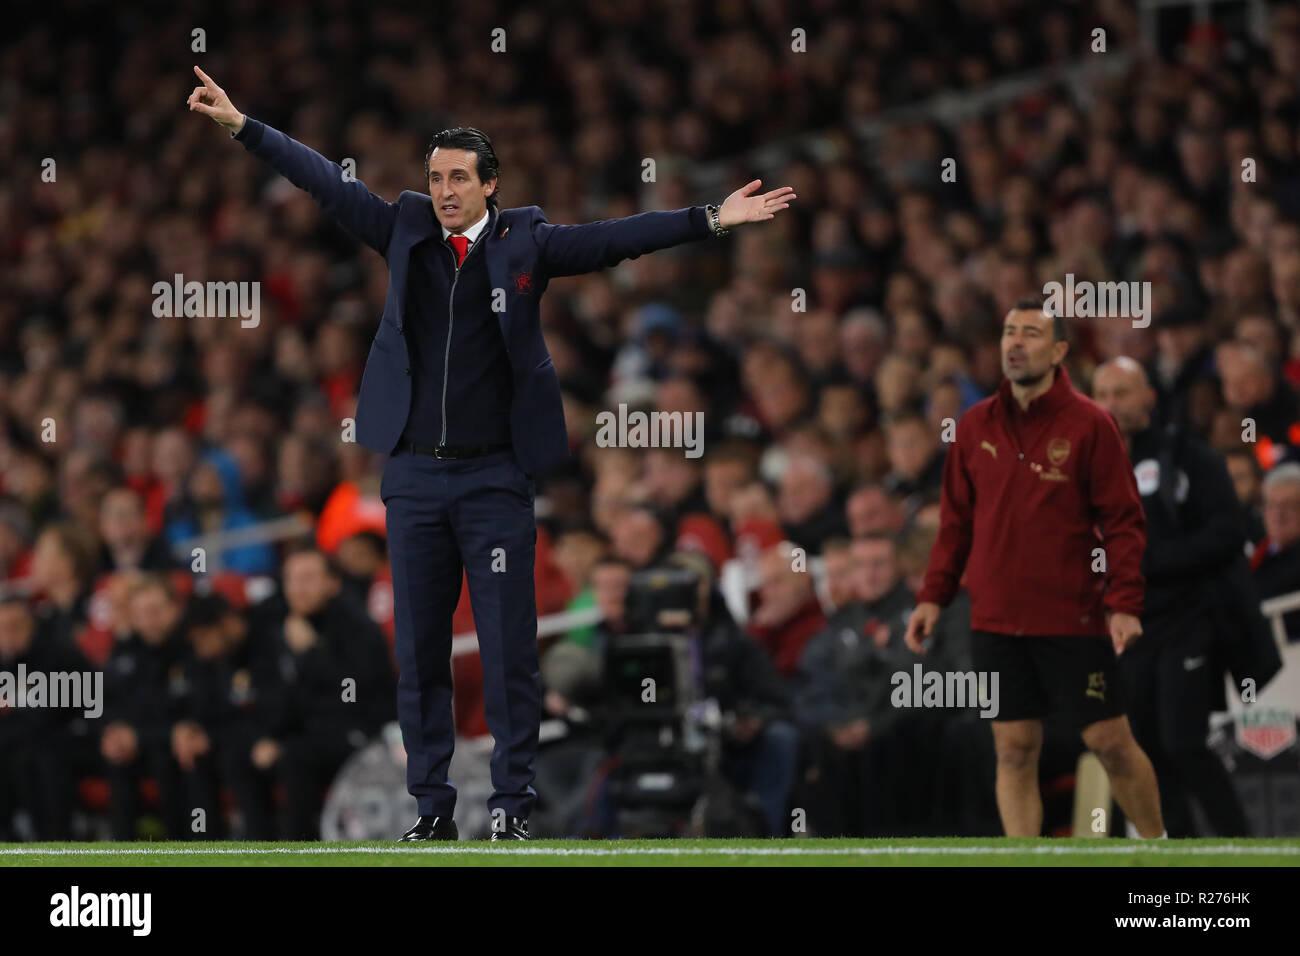 Manager of Arsenal, Unai Emery - Arsenal v Wolverhampton Wanderers, Premier League, Emirates Stadium, London (Holloway) - 11th November 2018 - Stock Image